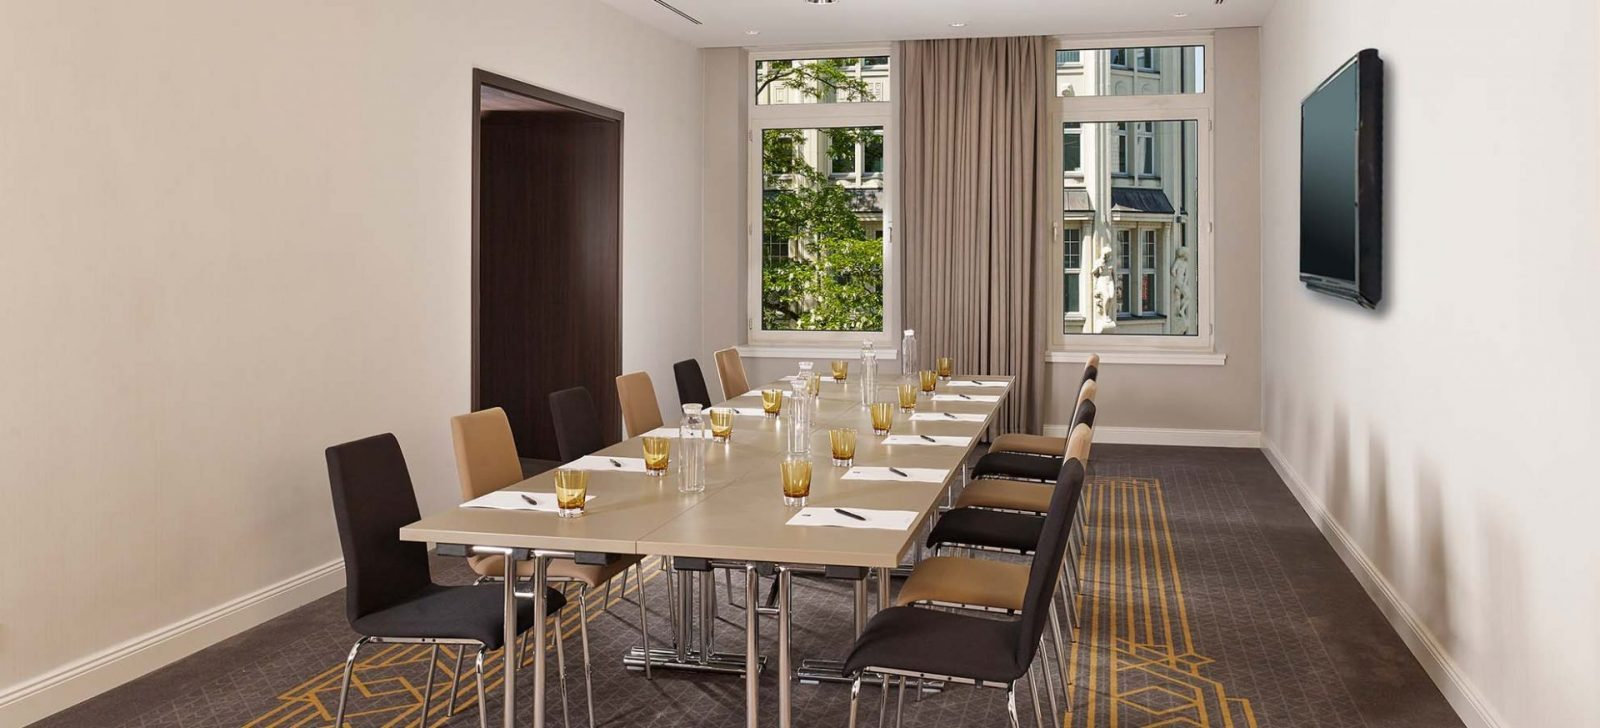 Reichshof Hotel Hamburg Tagungsraum Mandix / Meeting room Mandix